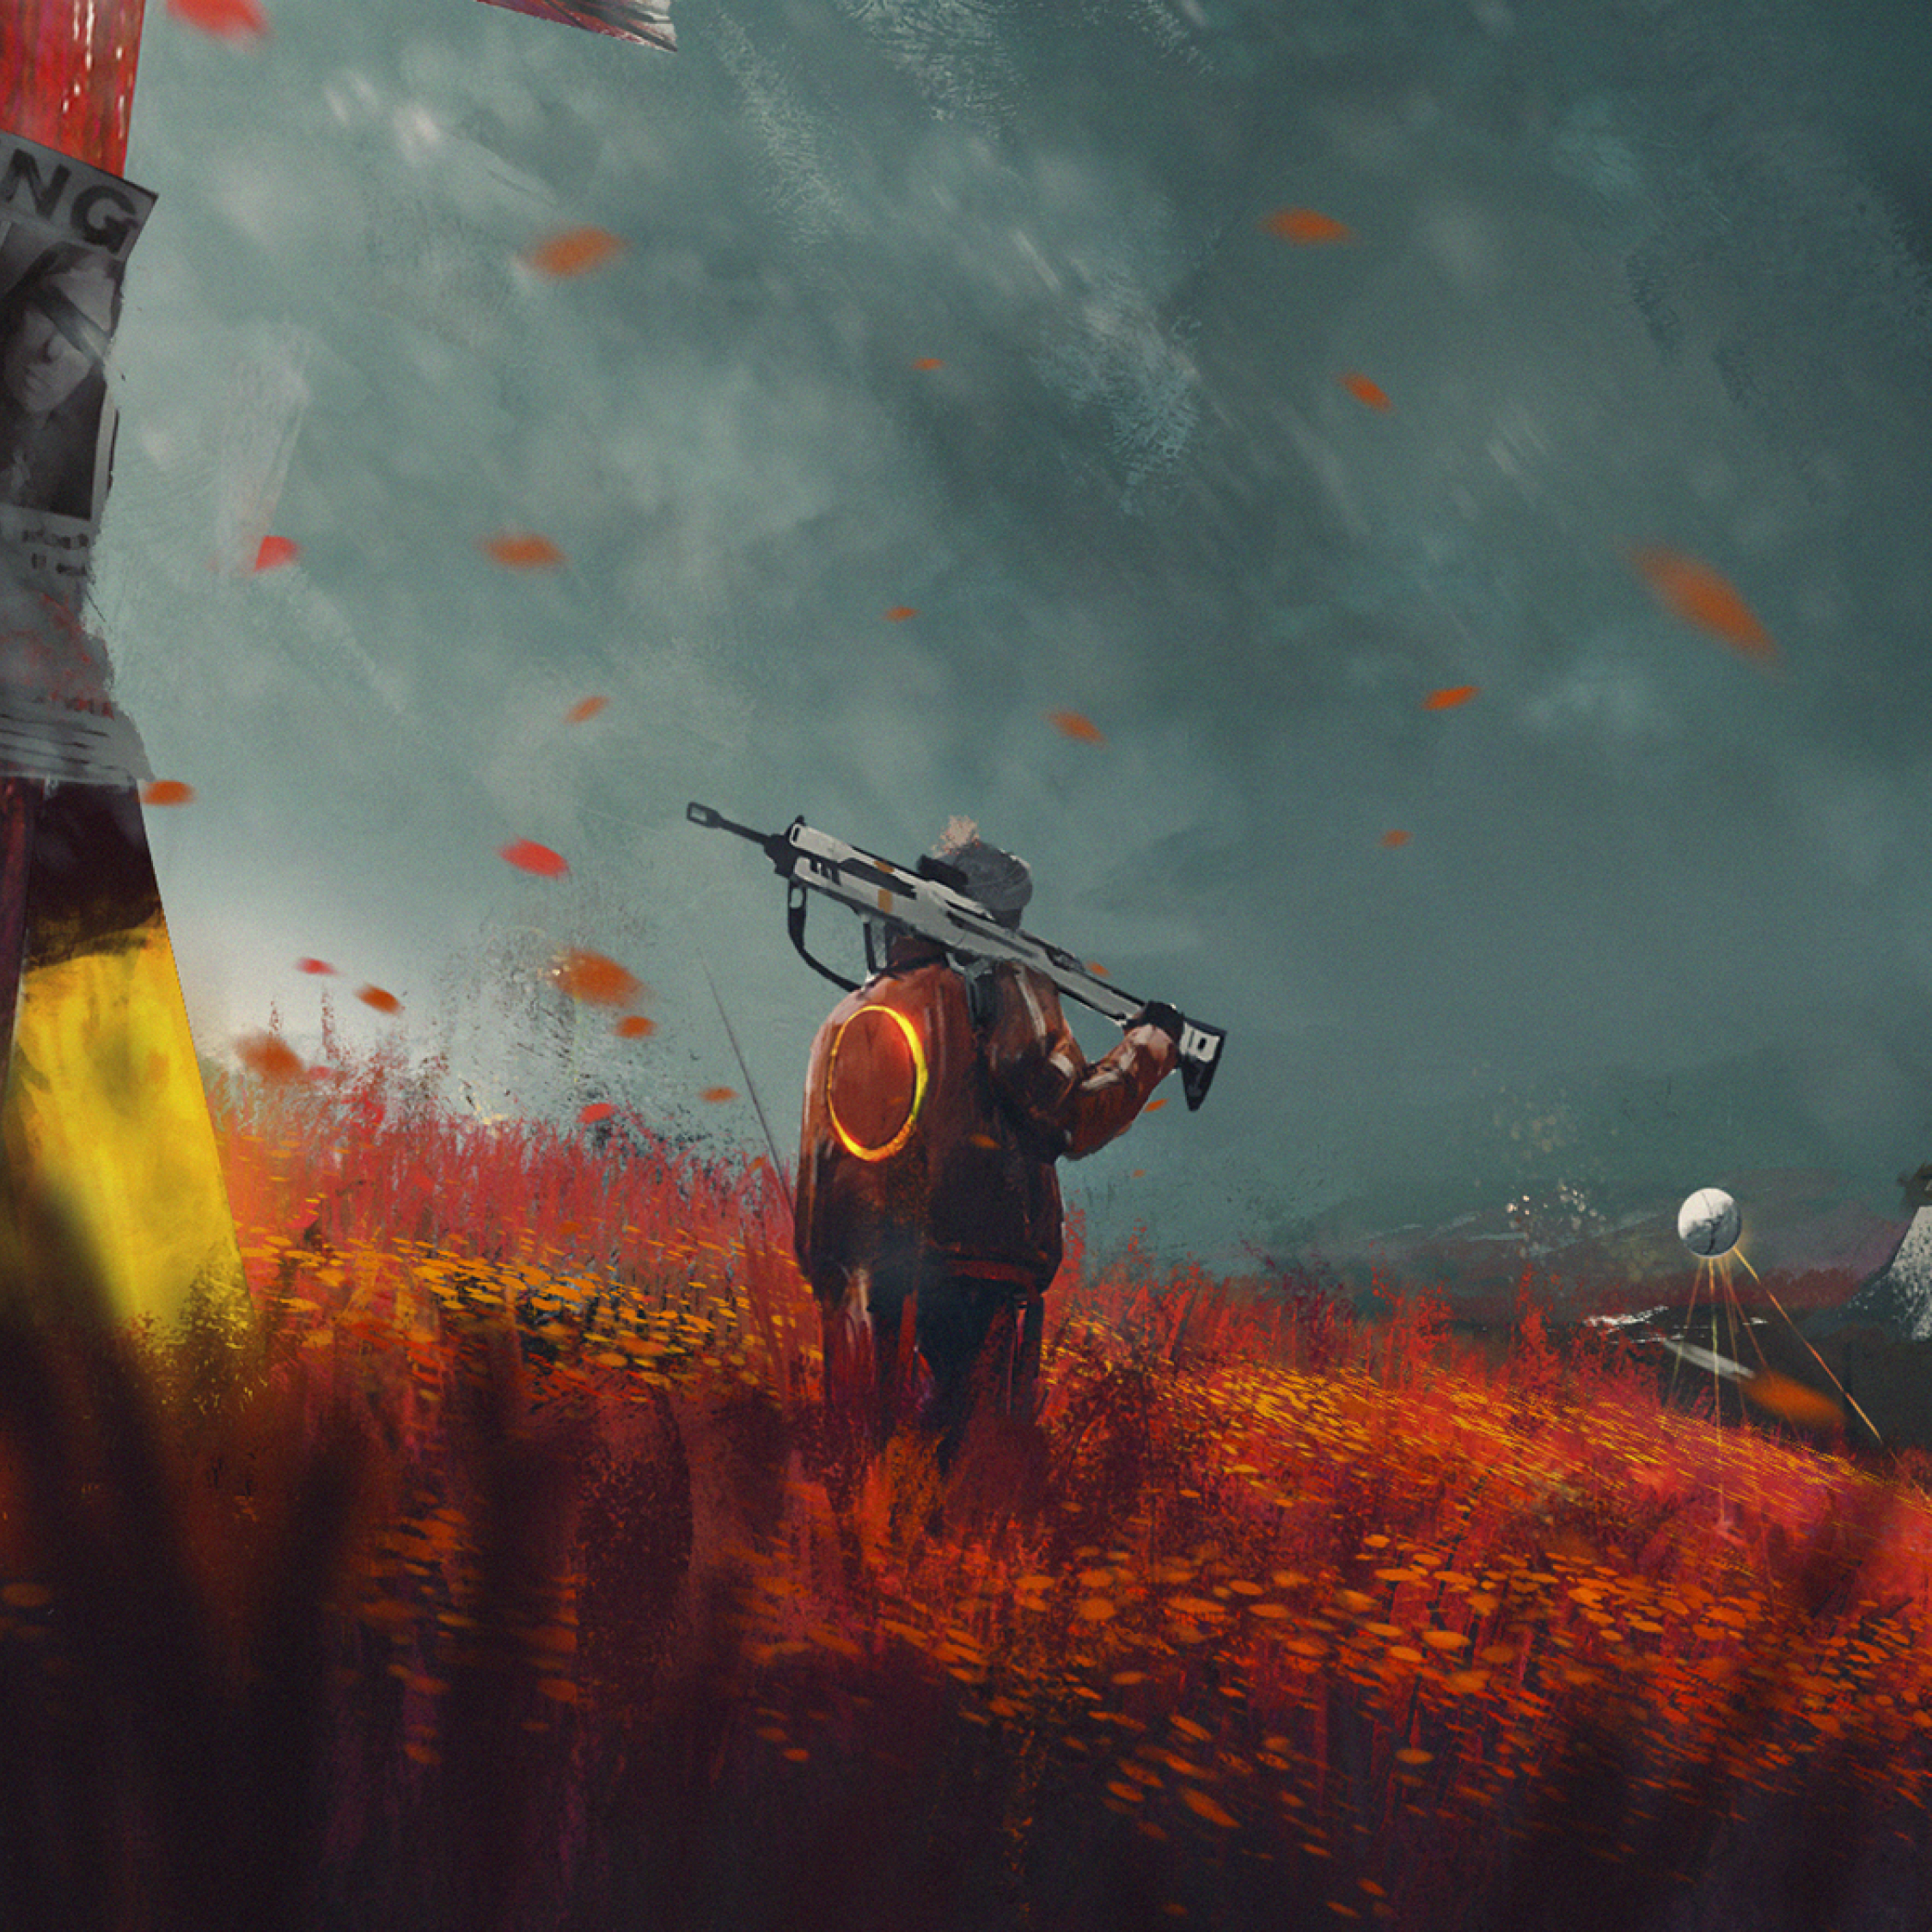 Destiny Desktop Wallpaper: Missing Alone Boy In Destiny 2 Farm Art, Full HD 2K Wallpaper